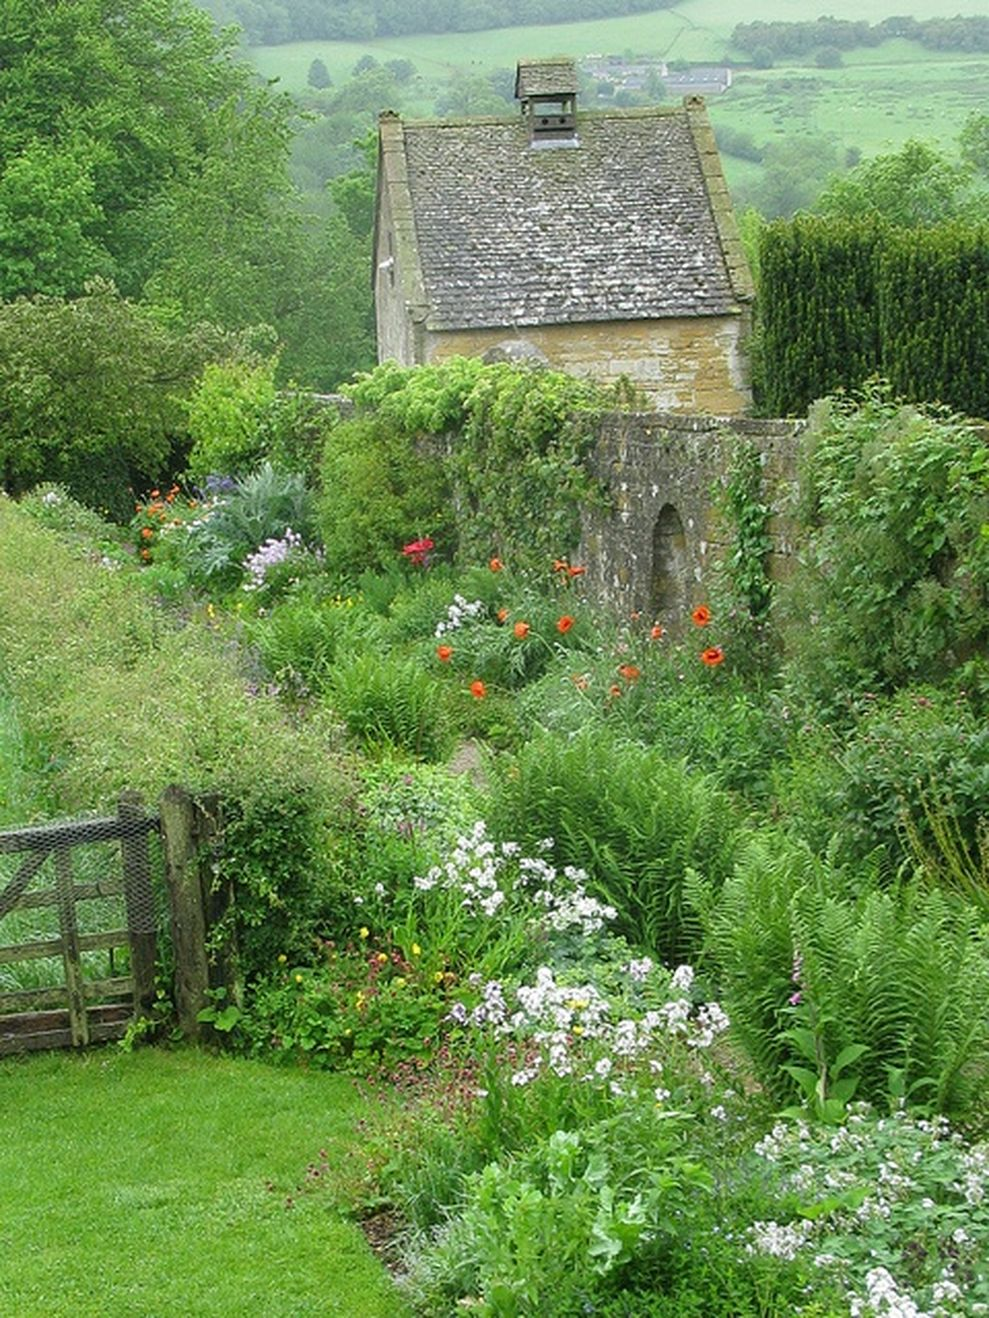 Beautiful french cottage garden design ideas 10 - ROUNDECOR